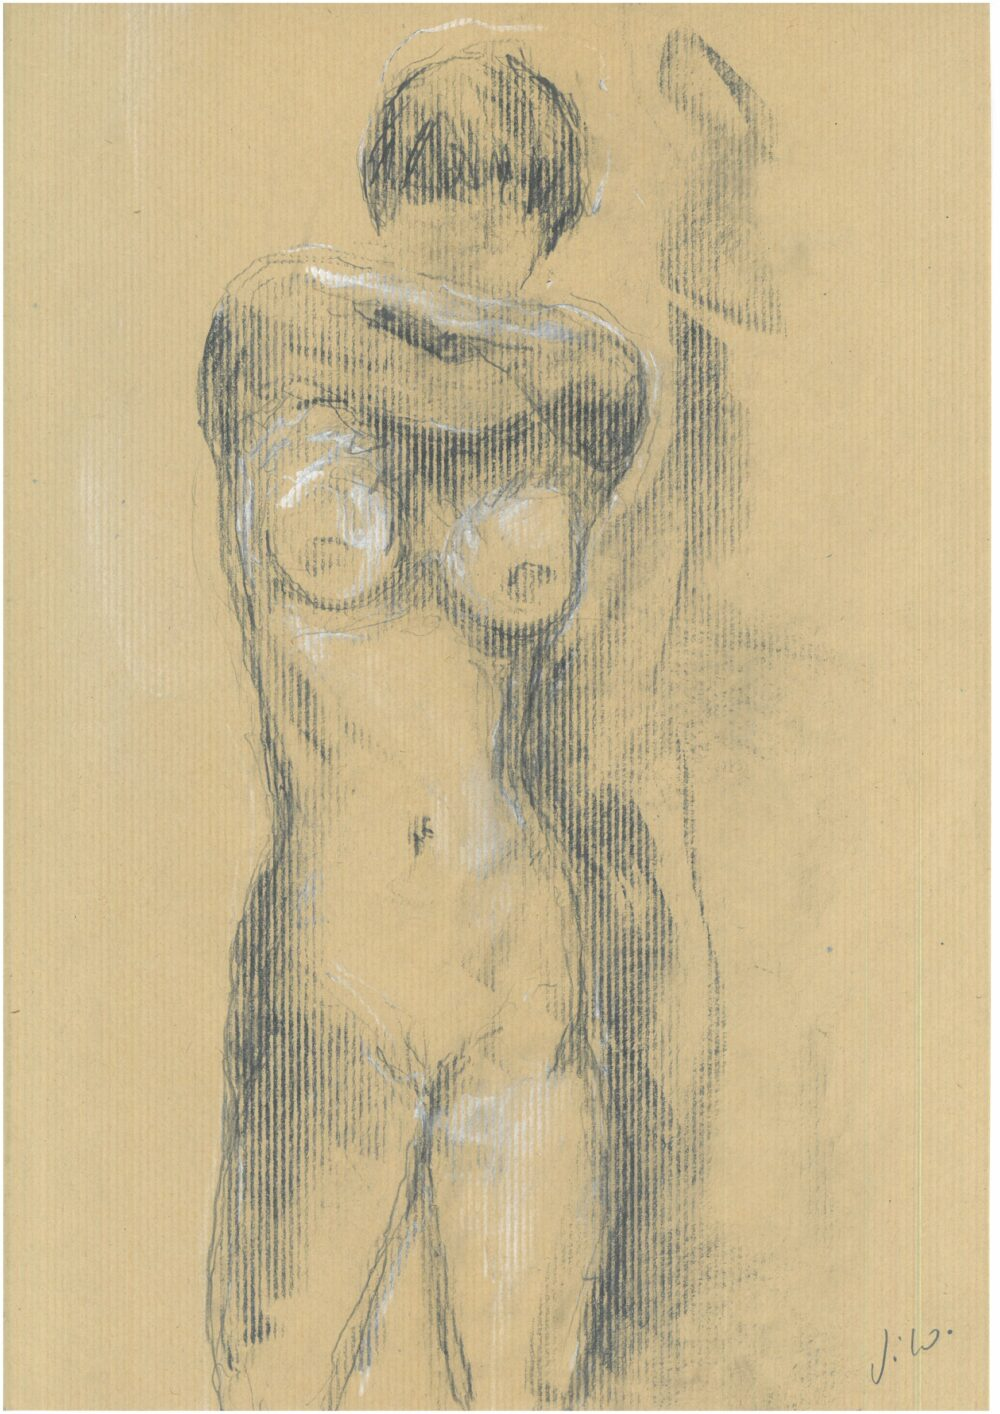 MONIKA 3 Victor Lorenzi bel'arti